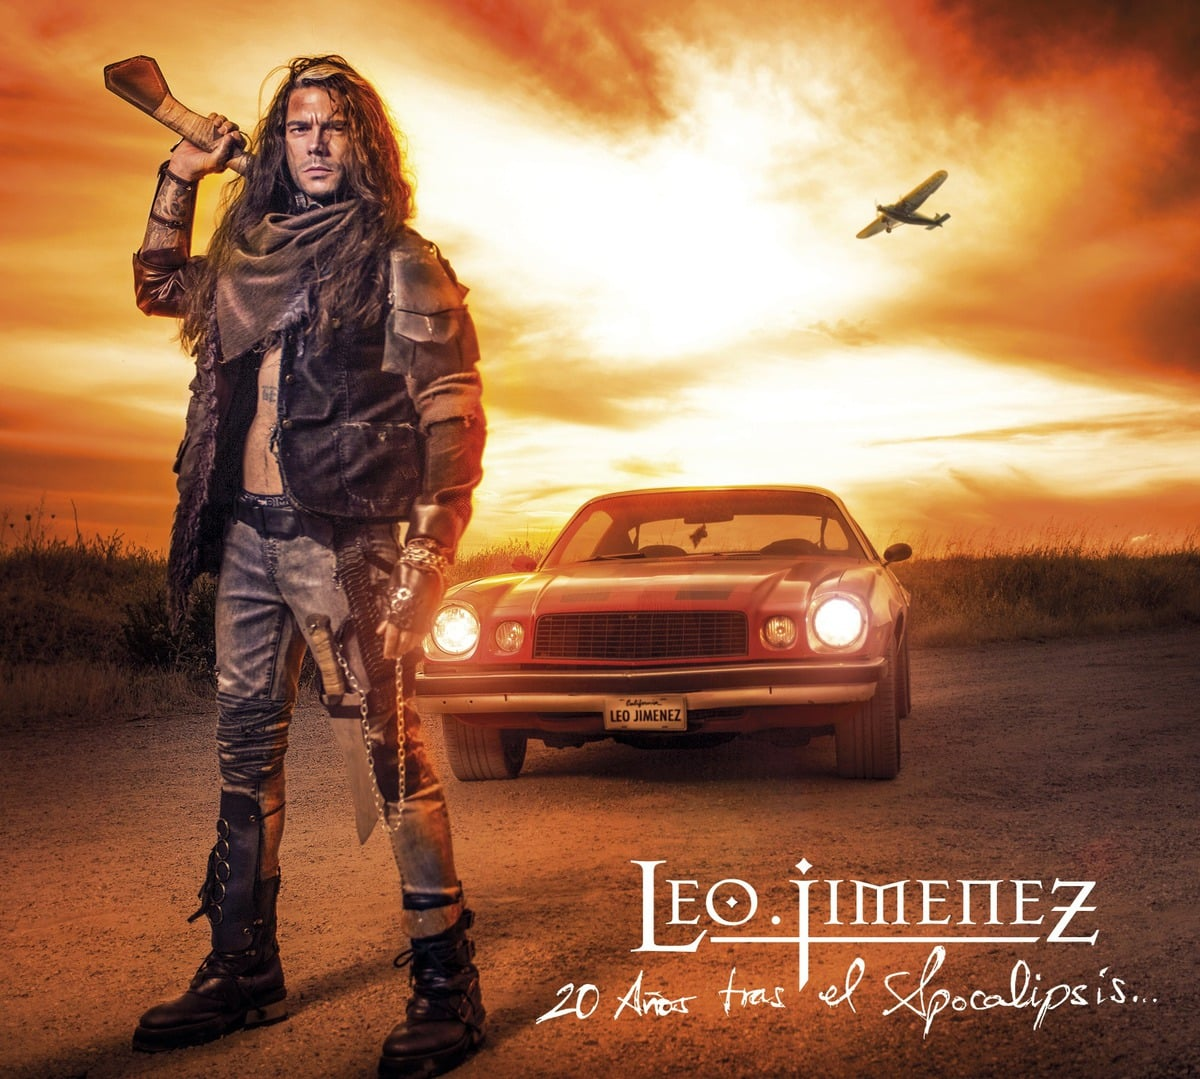 LEO JIMENEZ – 20 años tras el Apocalipsis, 2015